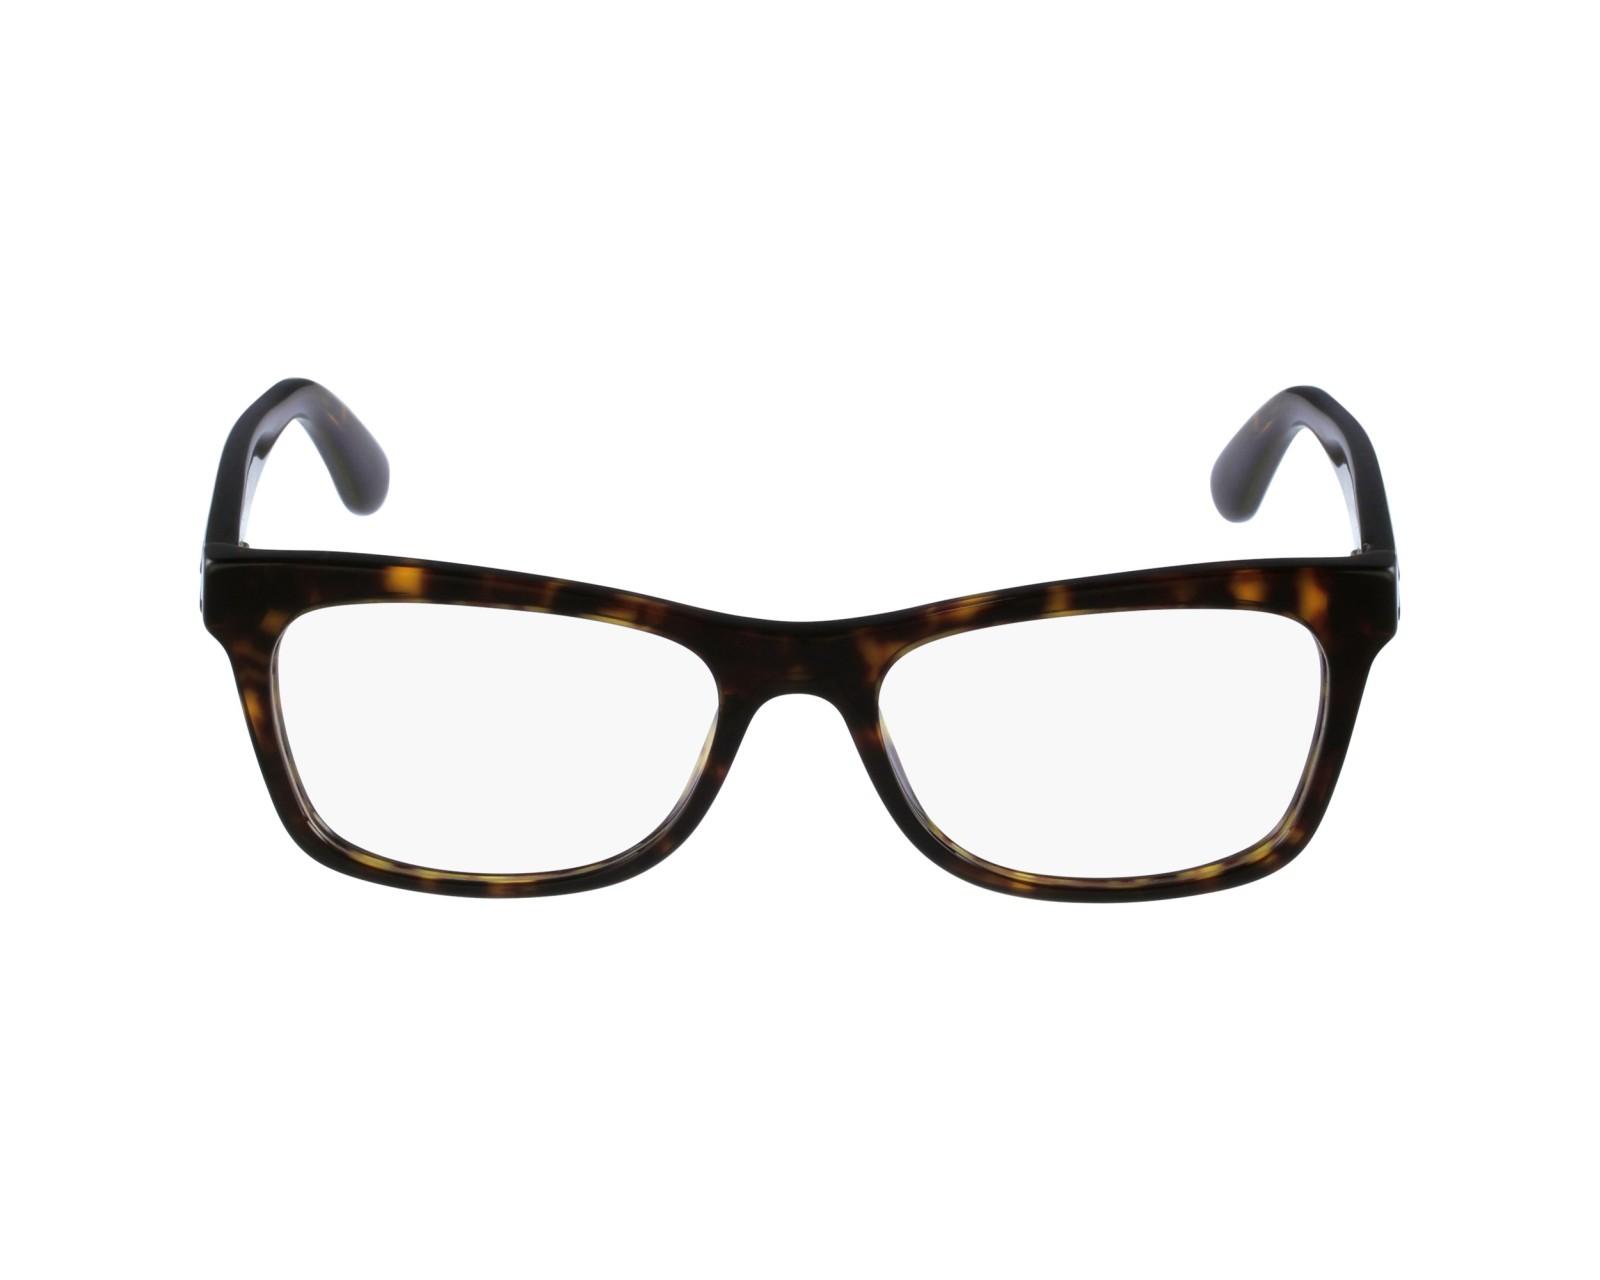 e2e5ced2da56 eyeglasses Dolce & Gabbana DG-3199 502 - Brown profile view